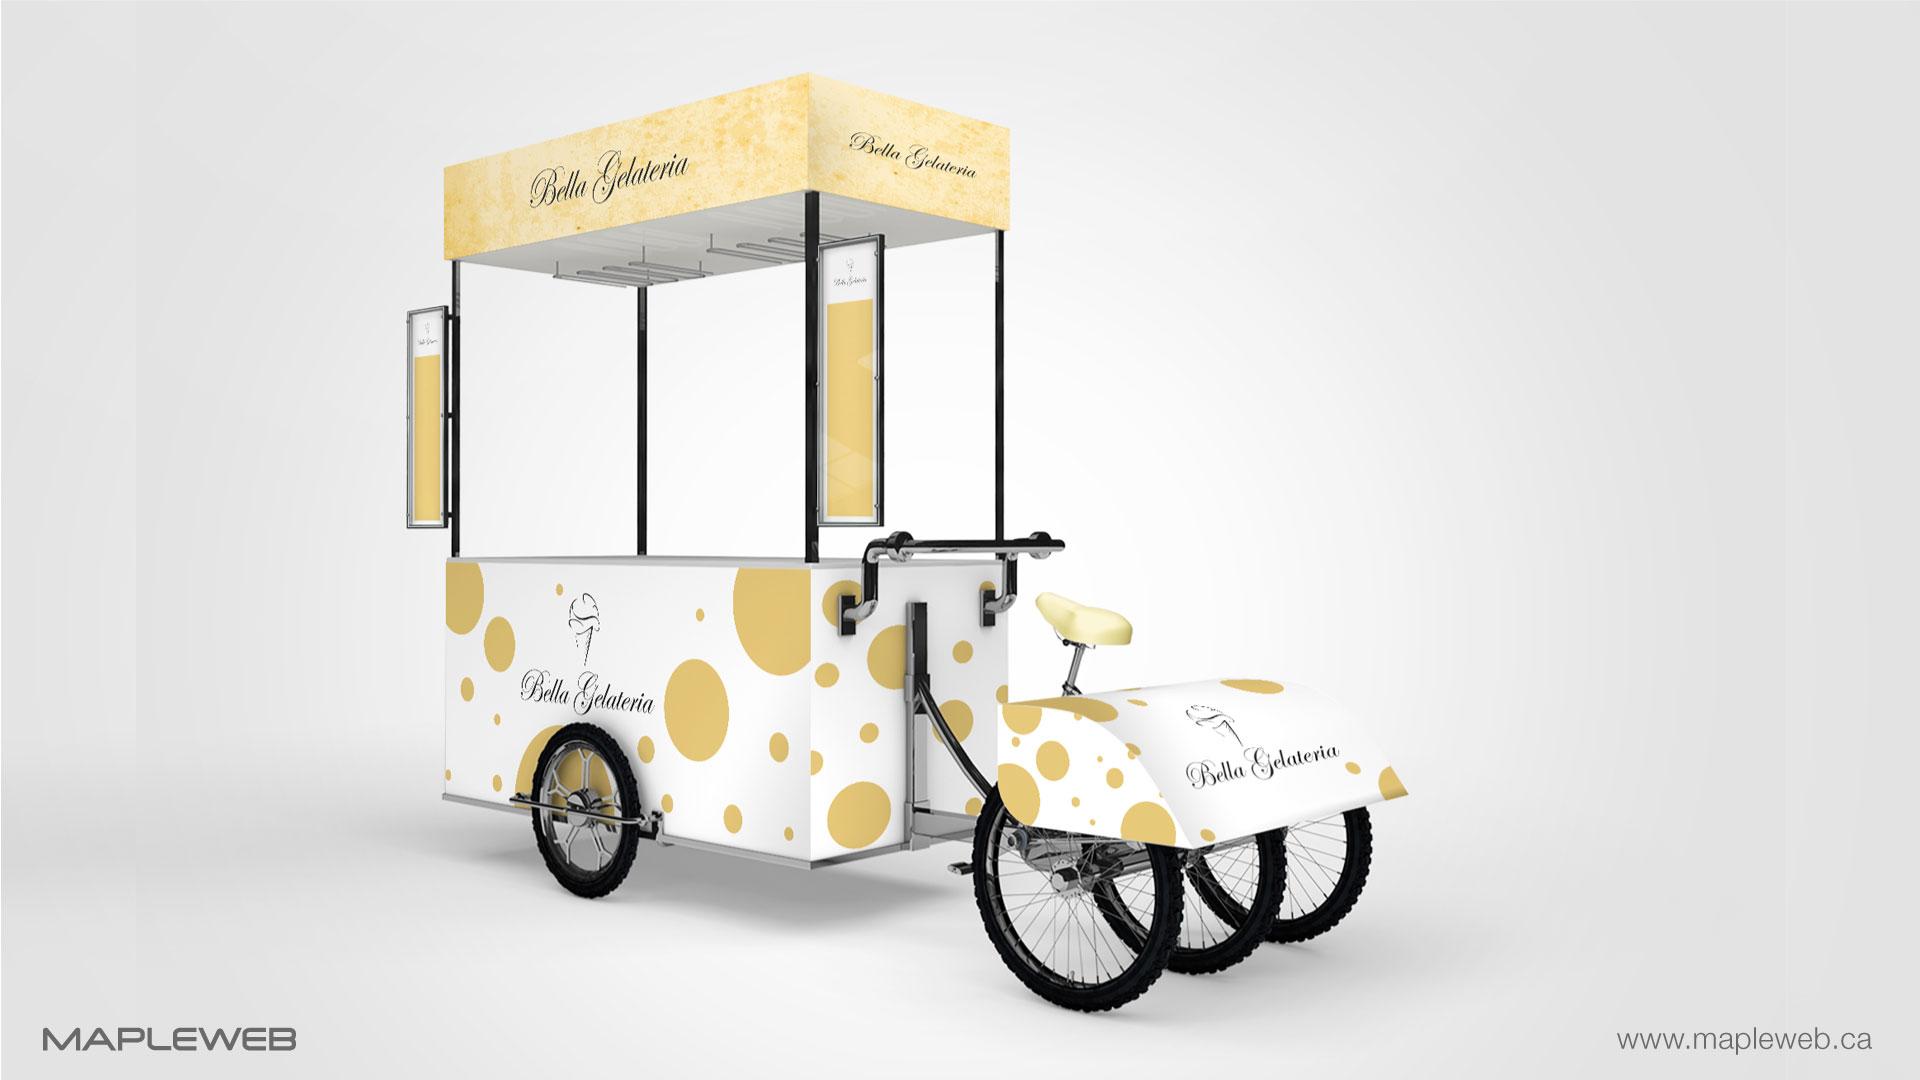 bella-gelateria-brand-logo-design-by-mapleweb-vancouver-canada-ice-creame-cart-mock